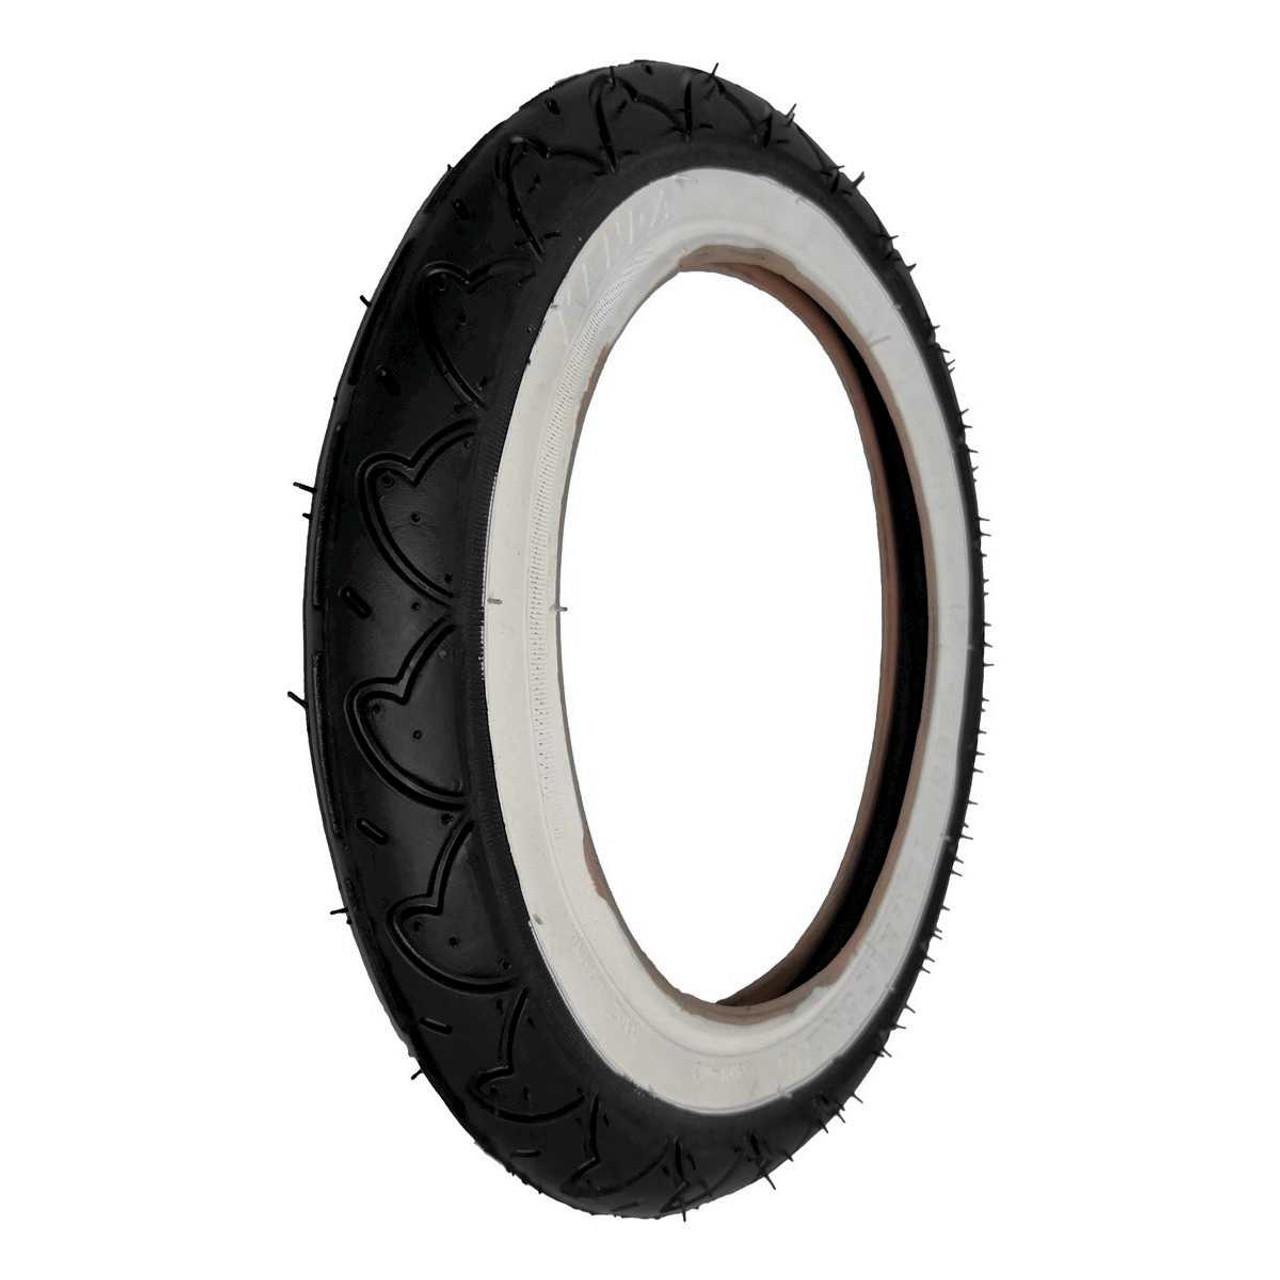 "Phil&Teds Tyre Spare Part - 12.5"" Pram Tyre Vend Uncategorized 21.95"